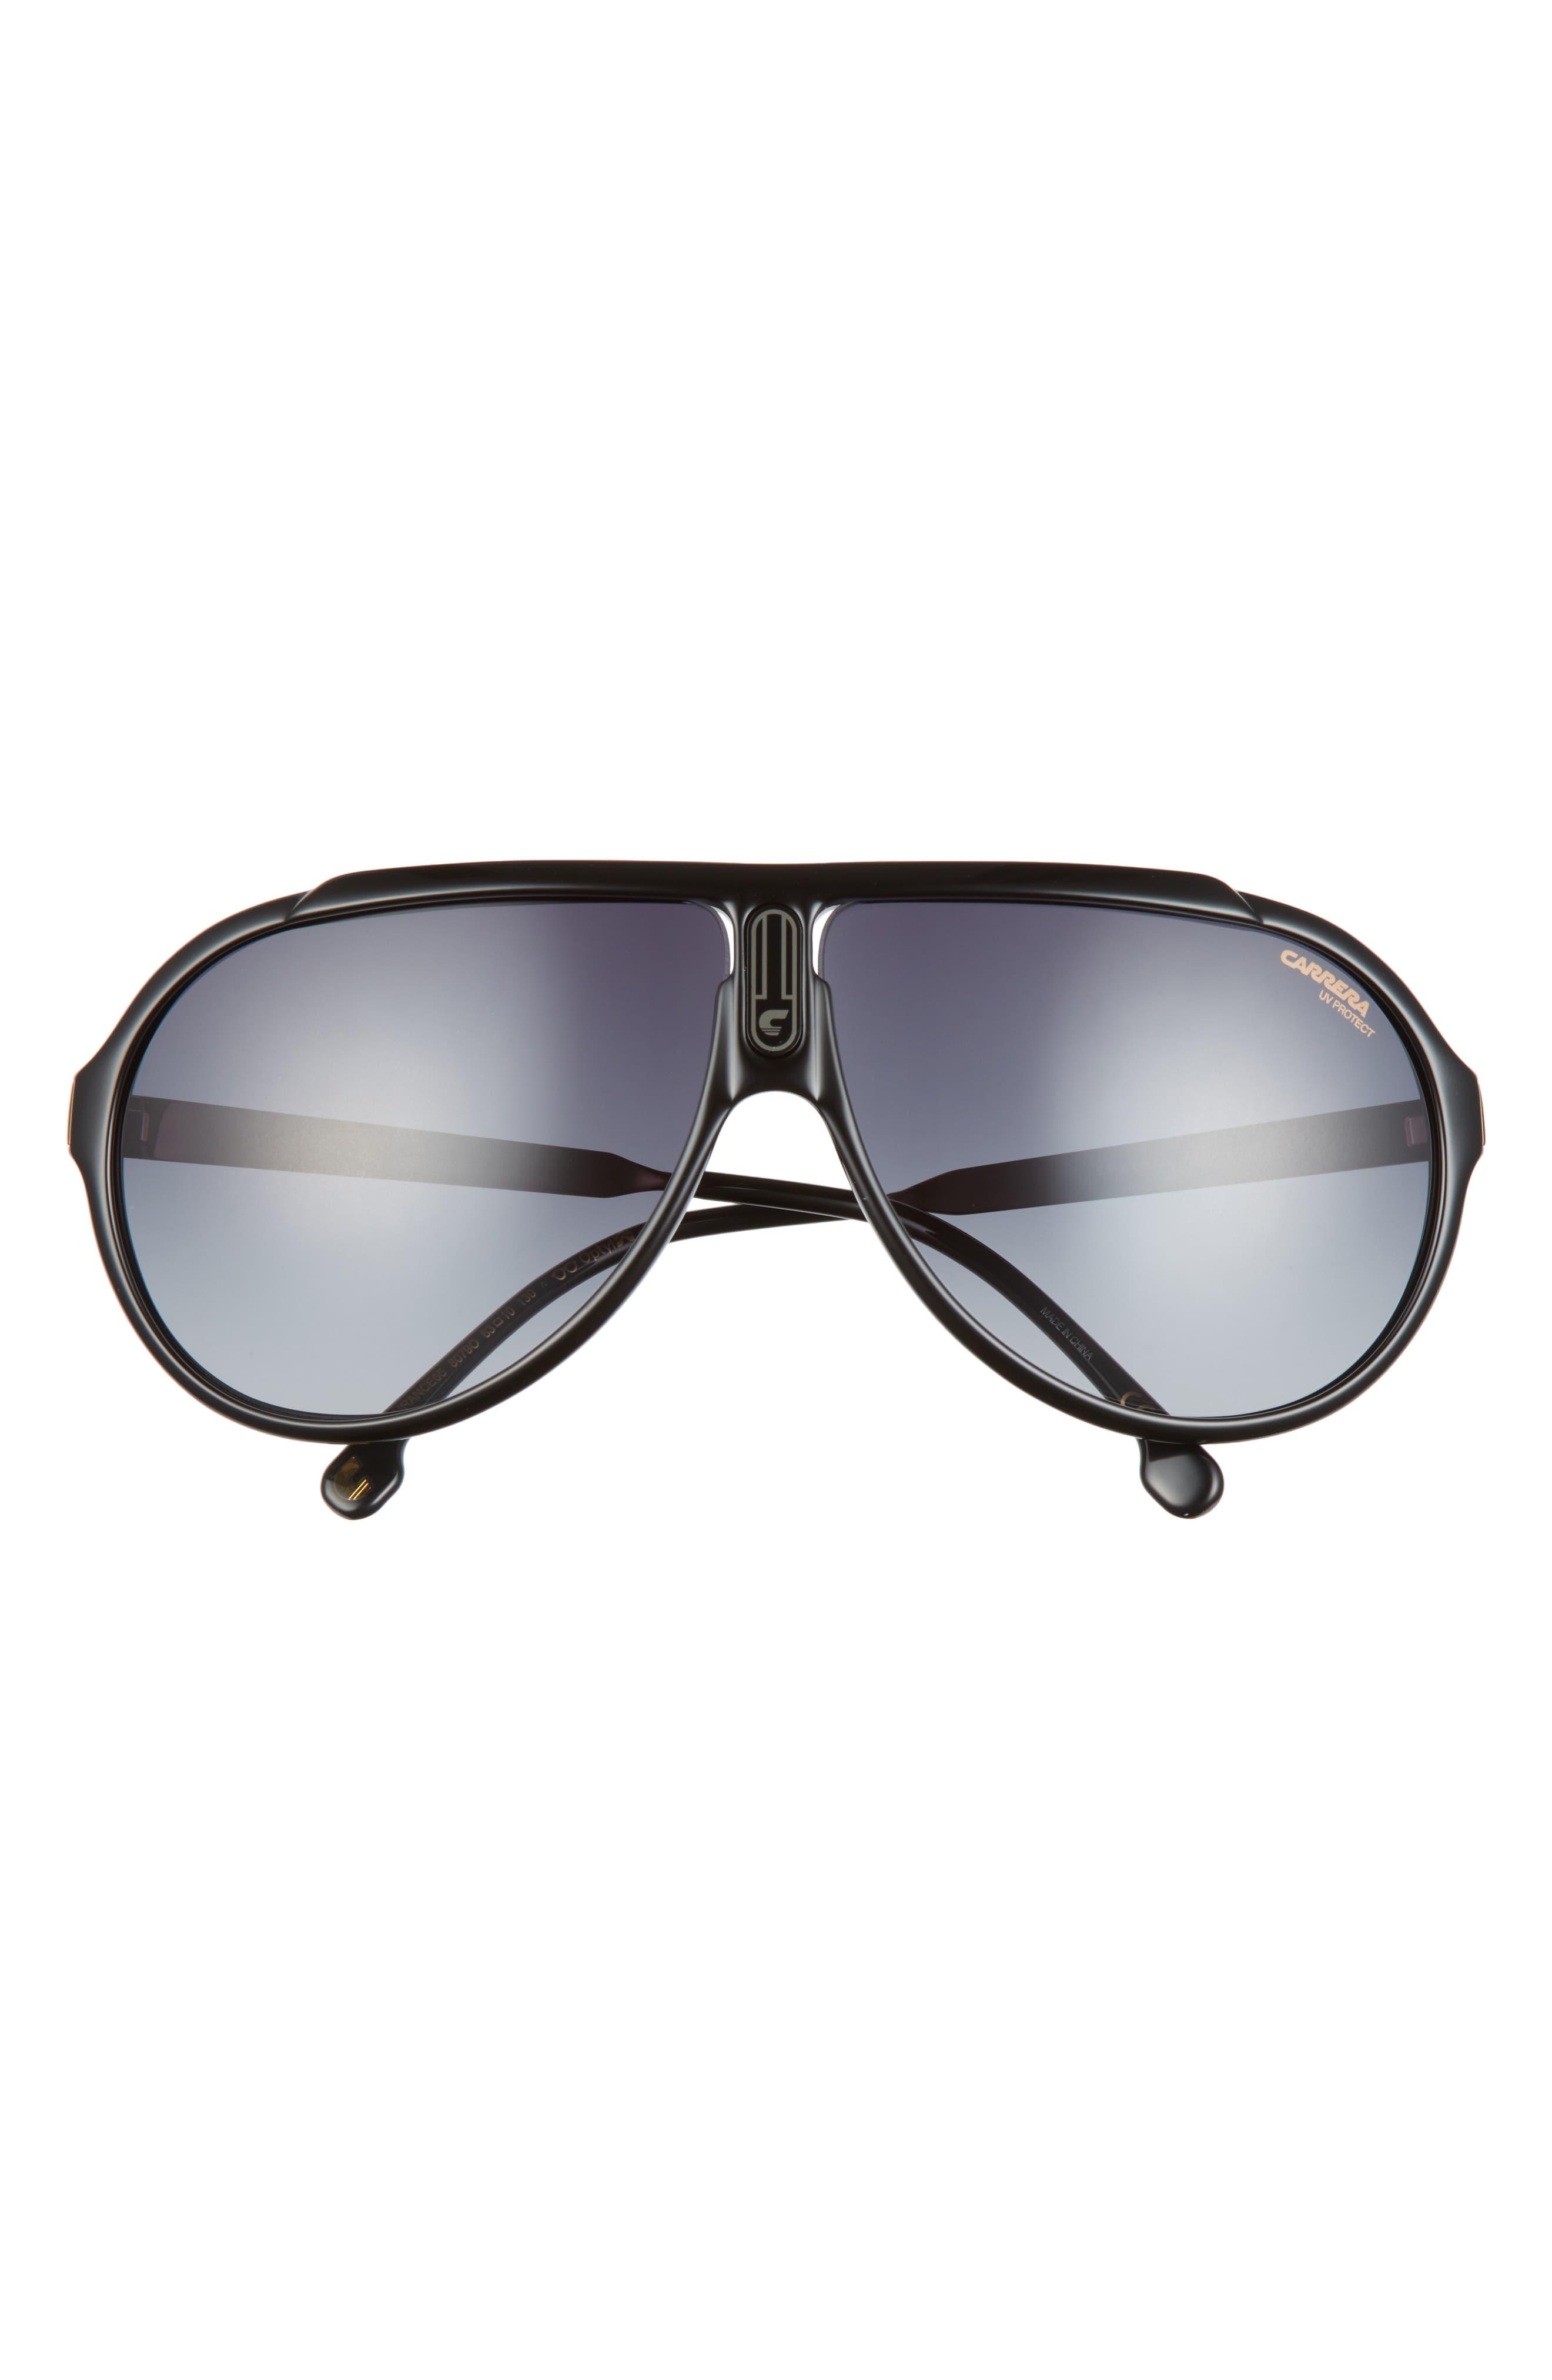 Endurance 63mm Gradient Oversize Aviator Sunglasses